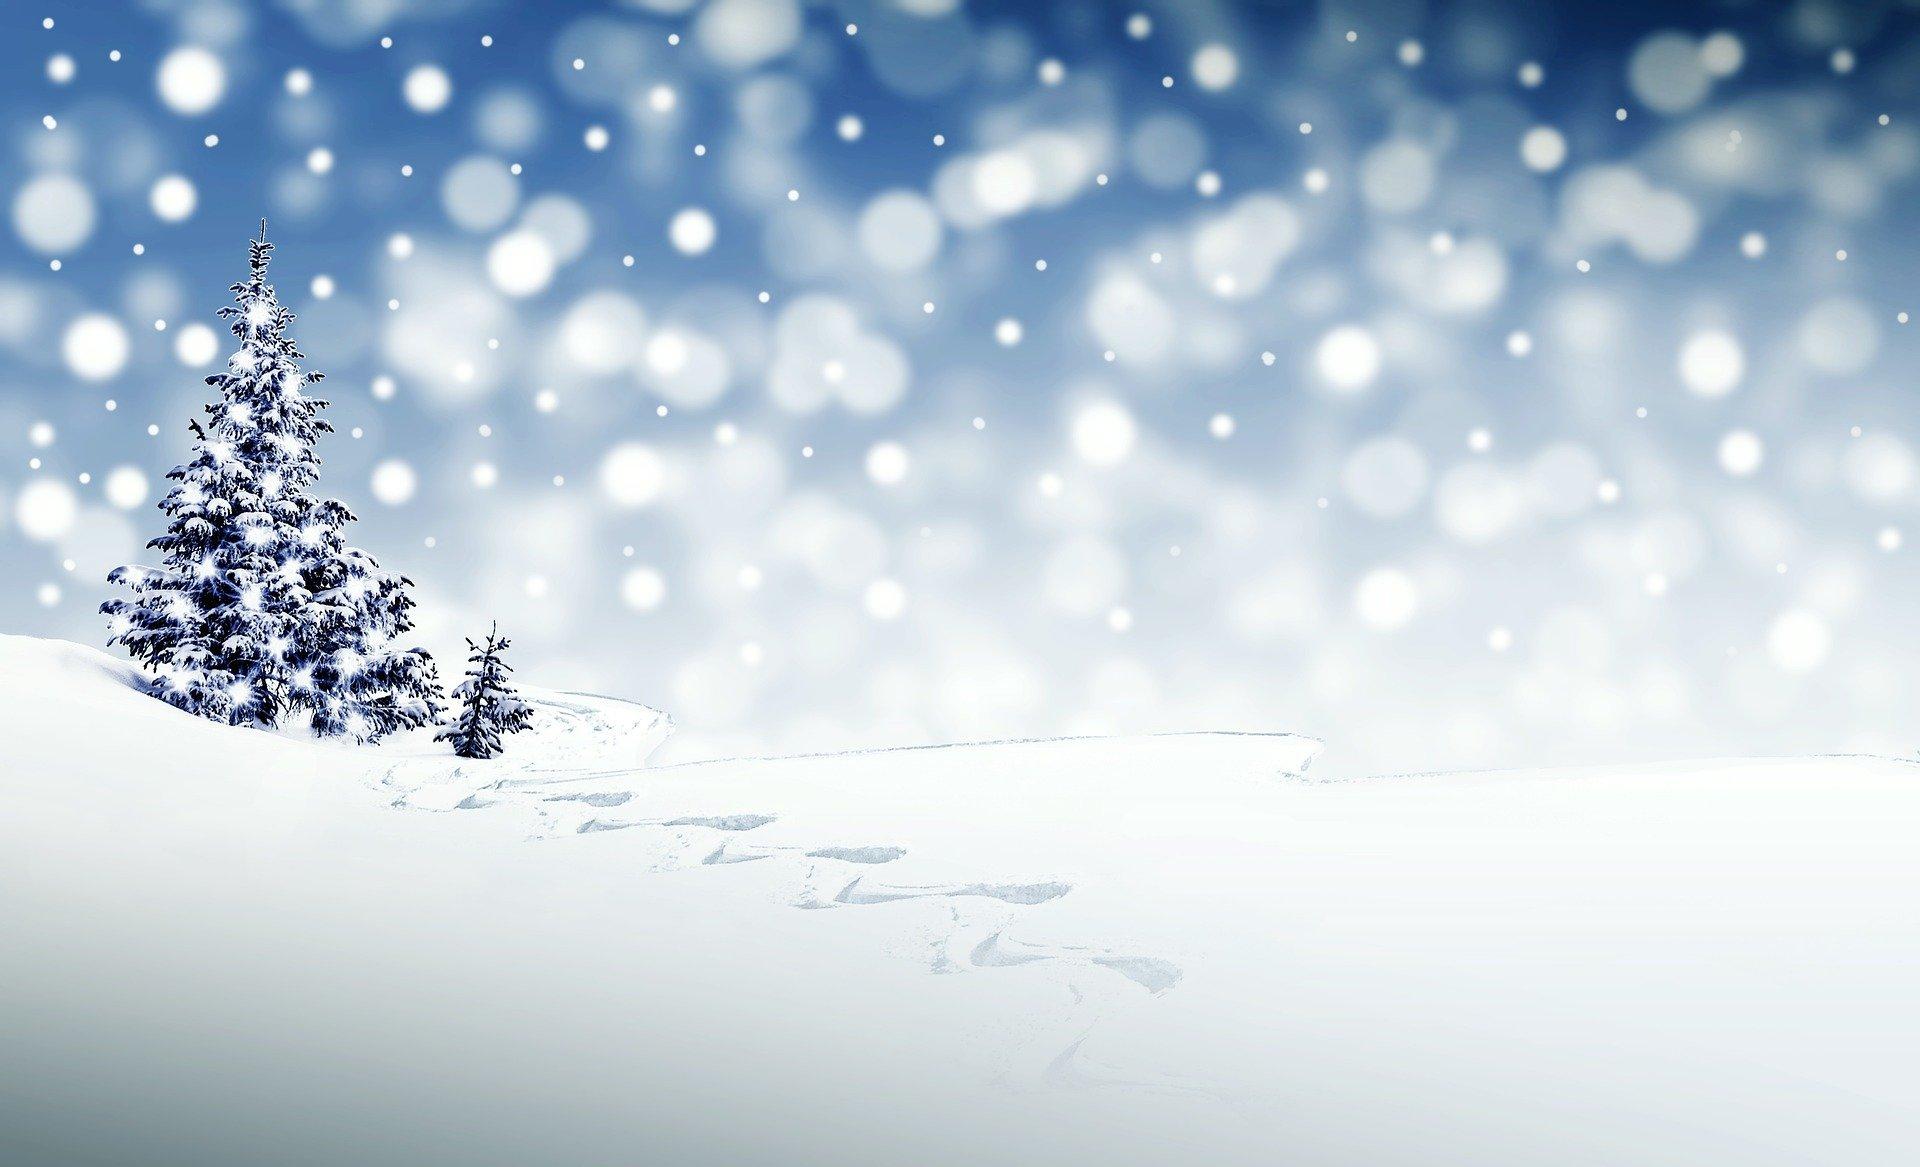 [WEEKLY RASSI] 스윙기어+1054% 수익실현 - 12월 2째주 라씨 AI매매성과